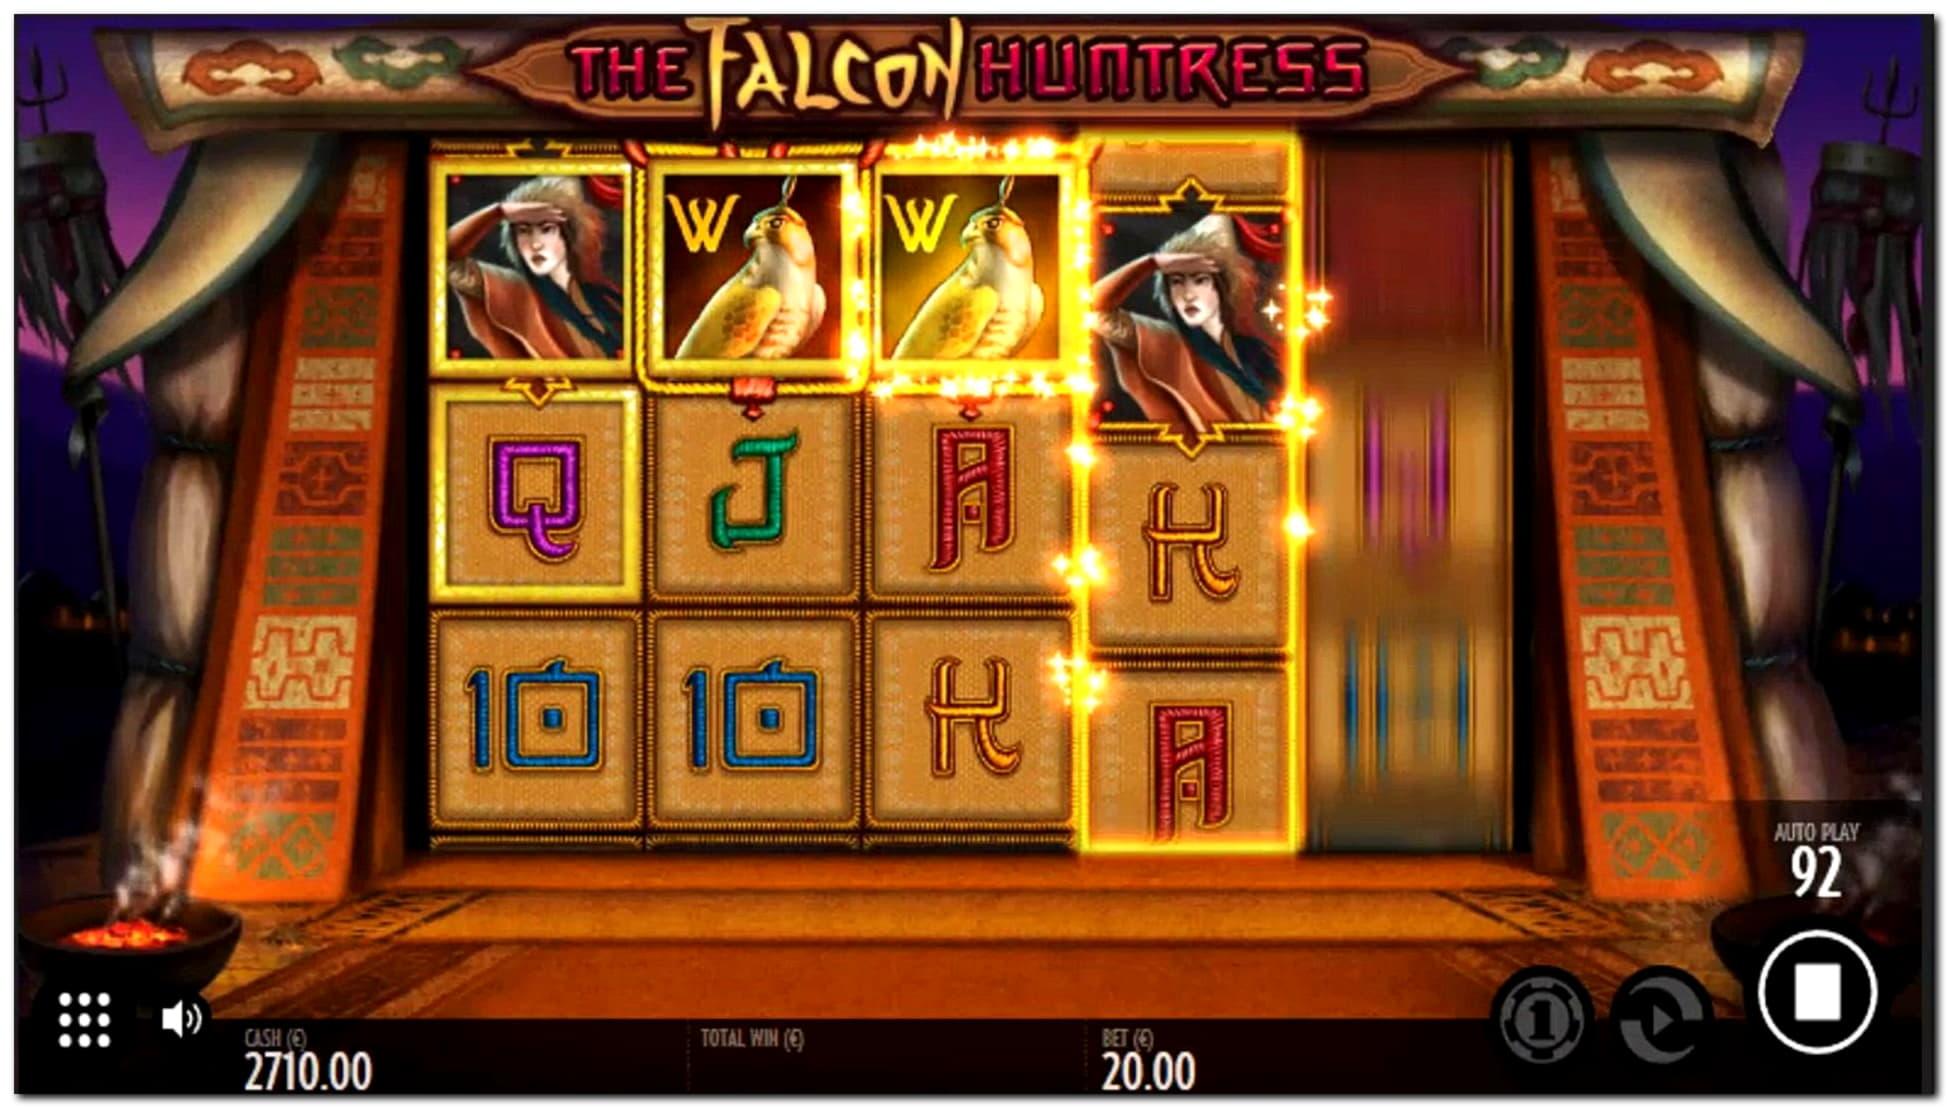 130 Free Casino Spins at Casino Cruise